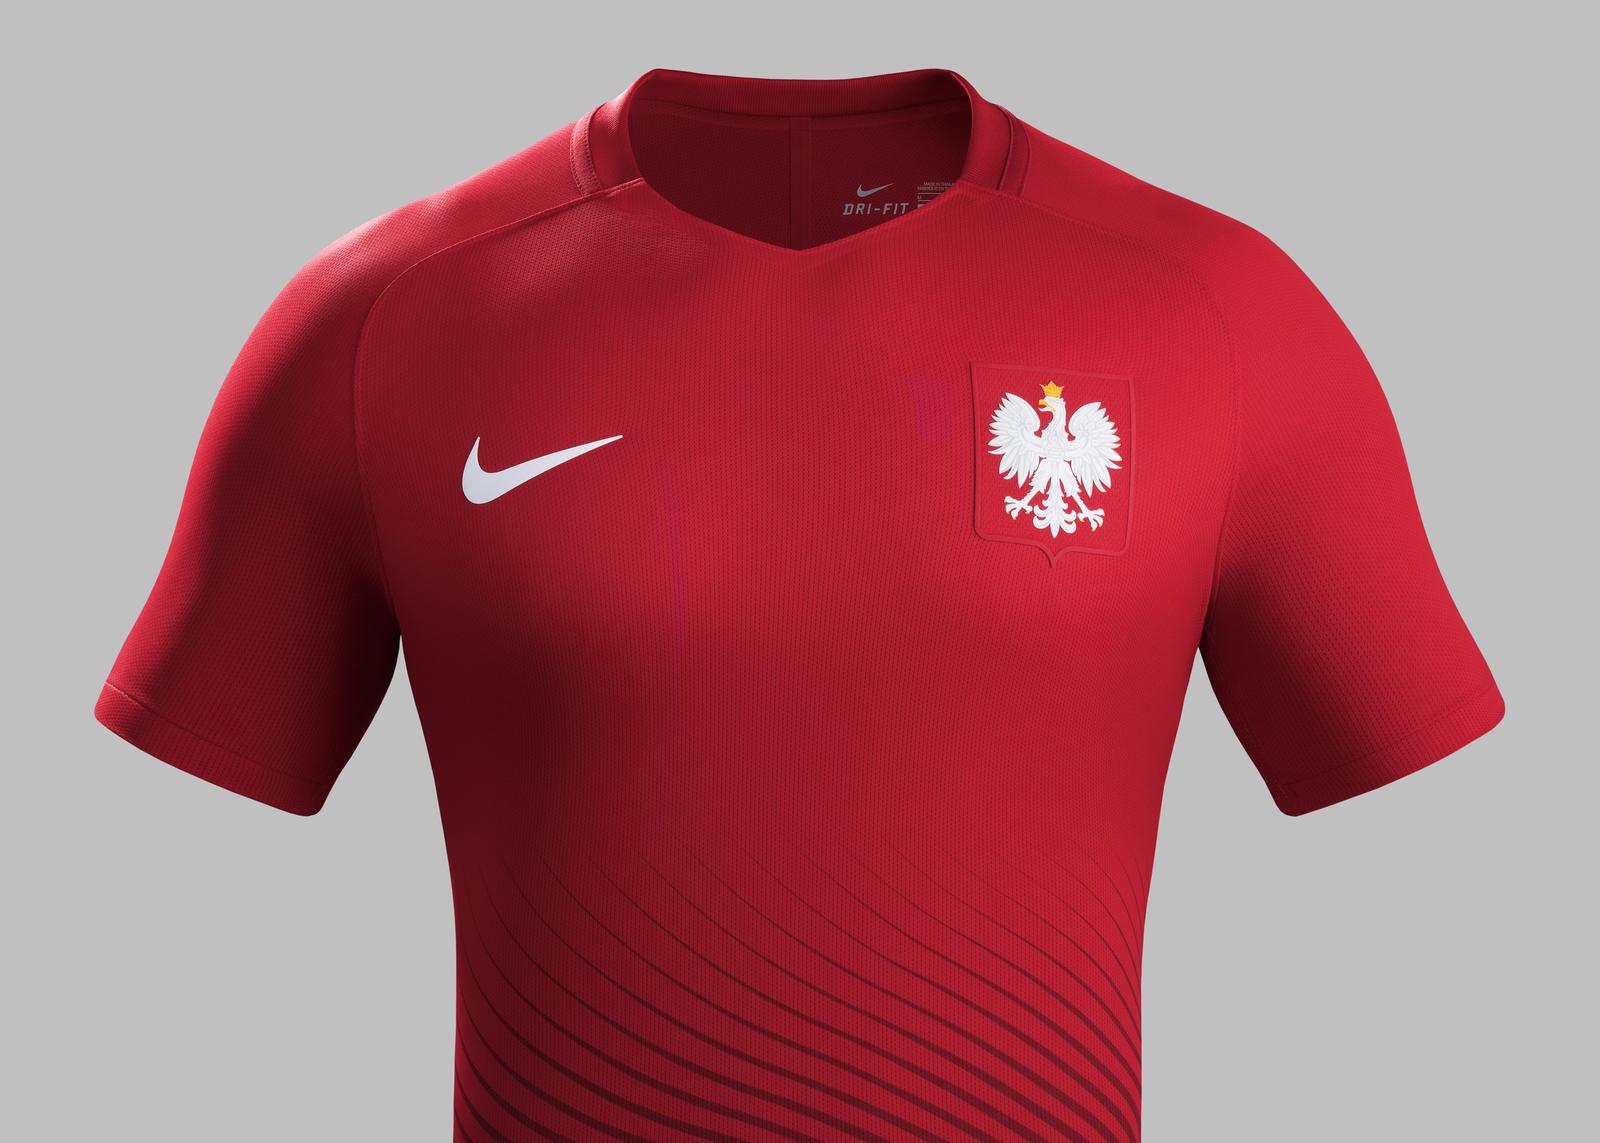 reputable site c0d59 b119a Poland 2016 National Football Kits - Nike News